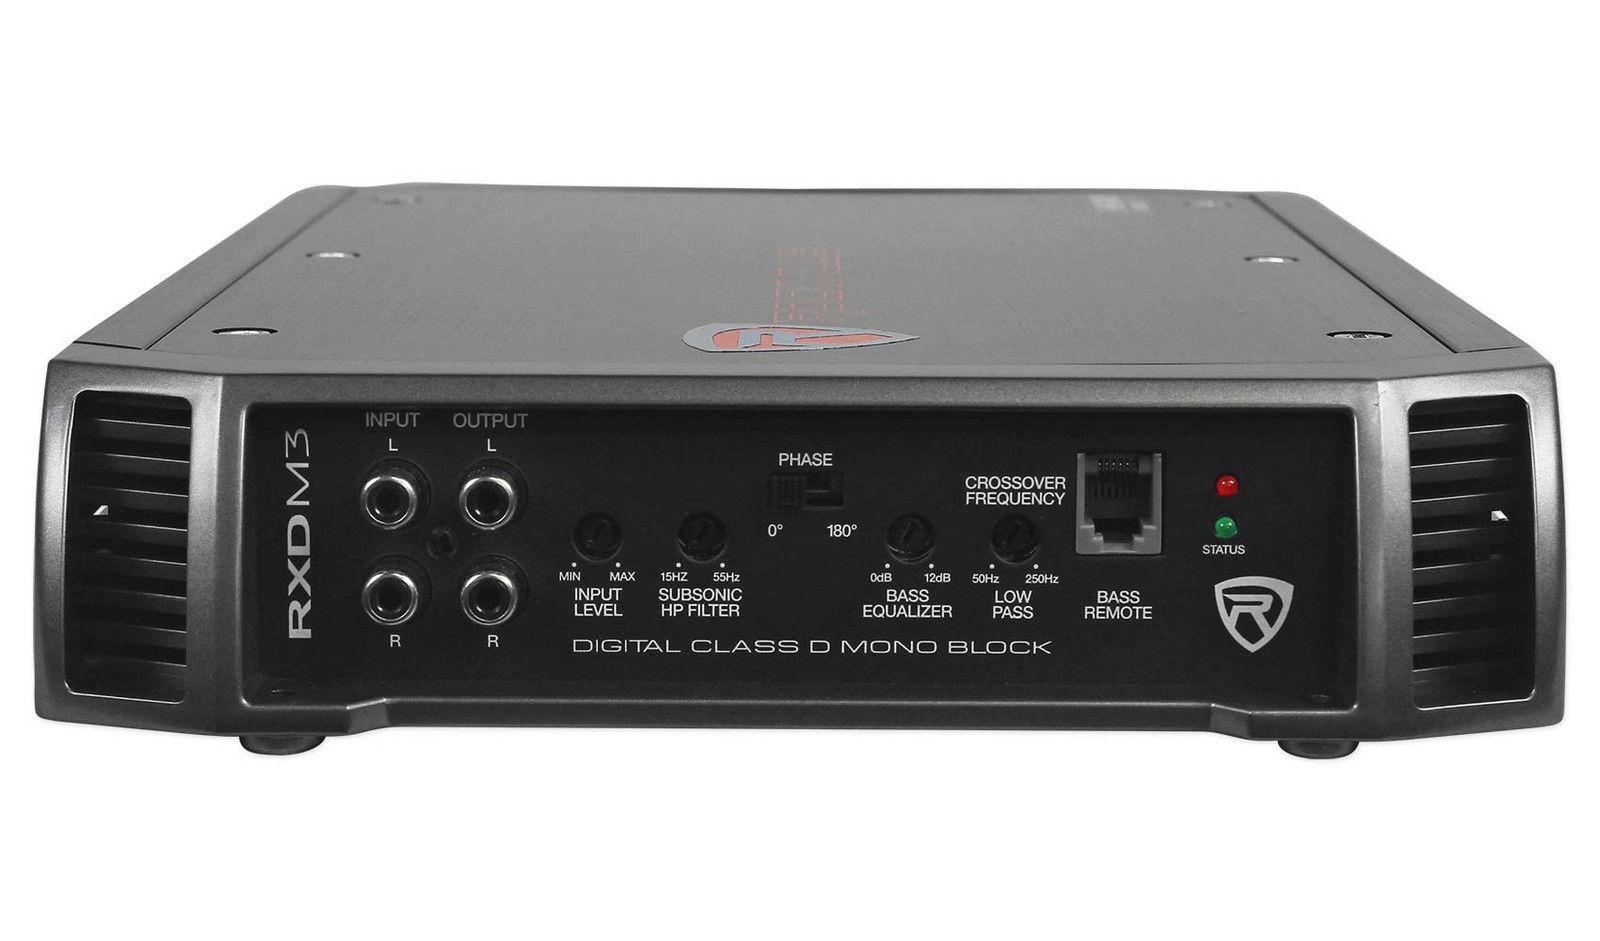 85 2000 Rms Amps Car Amplifiers Faq Get Quotations New Mb Quart Channel 2 000watt 24volt Truck Bus Rv Bridgeable Mosfet Amplifier Amazon Rockville Rxd M3 4000 Watt 2000w Mono Class D 1 Ohm